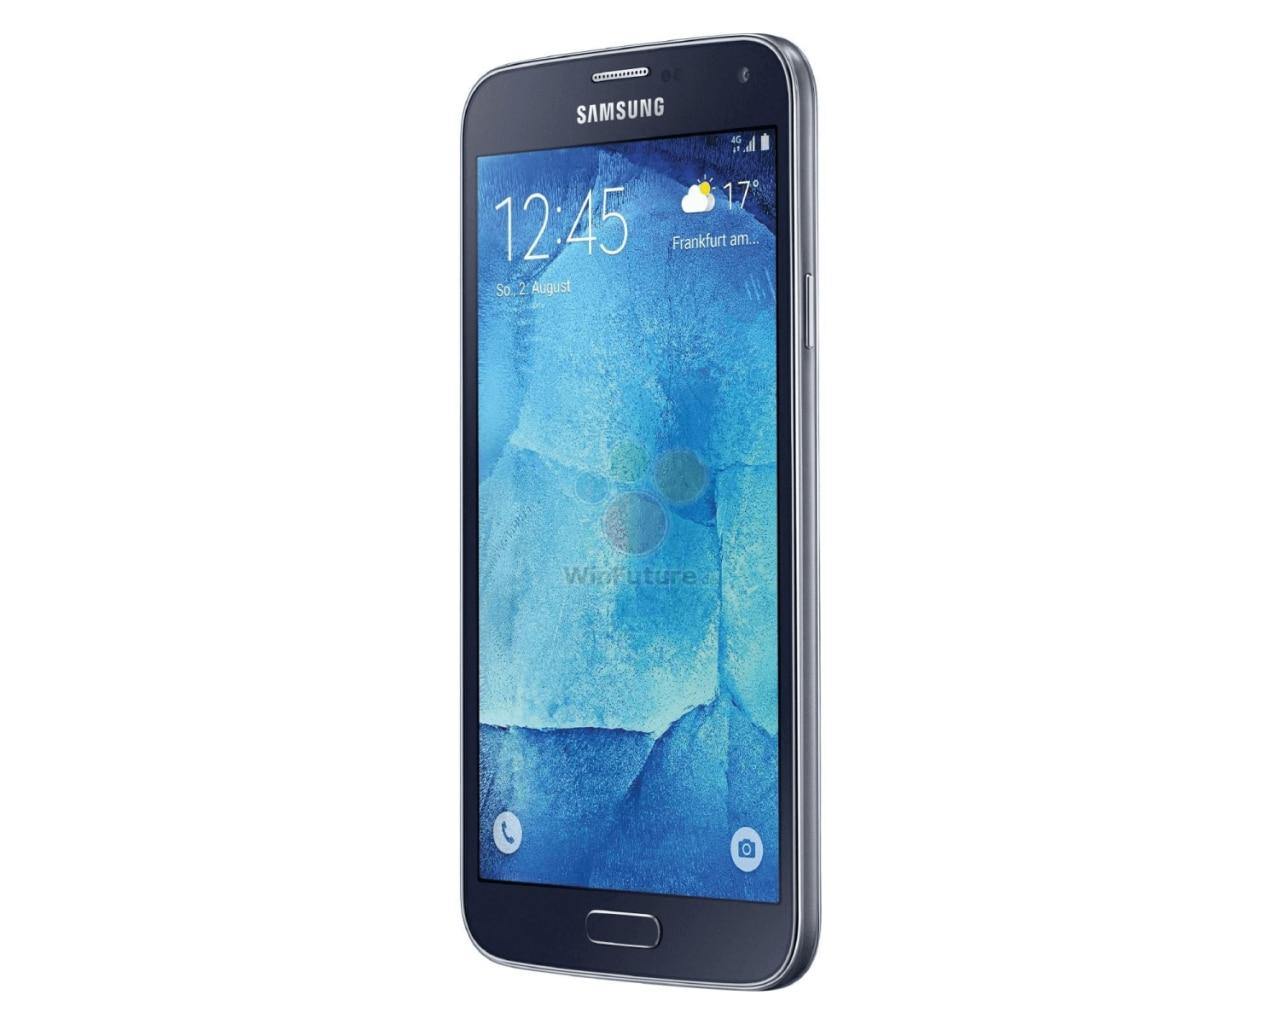 Samsung Galaxy S5 Neo - 9